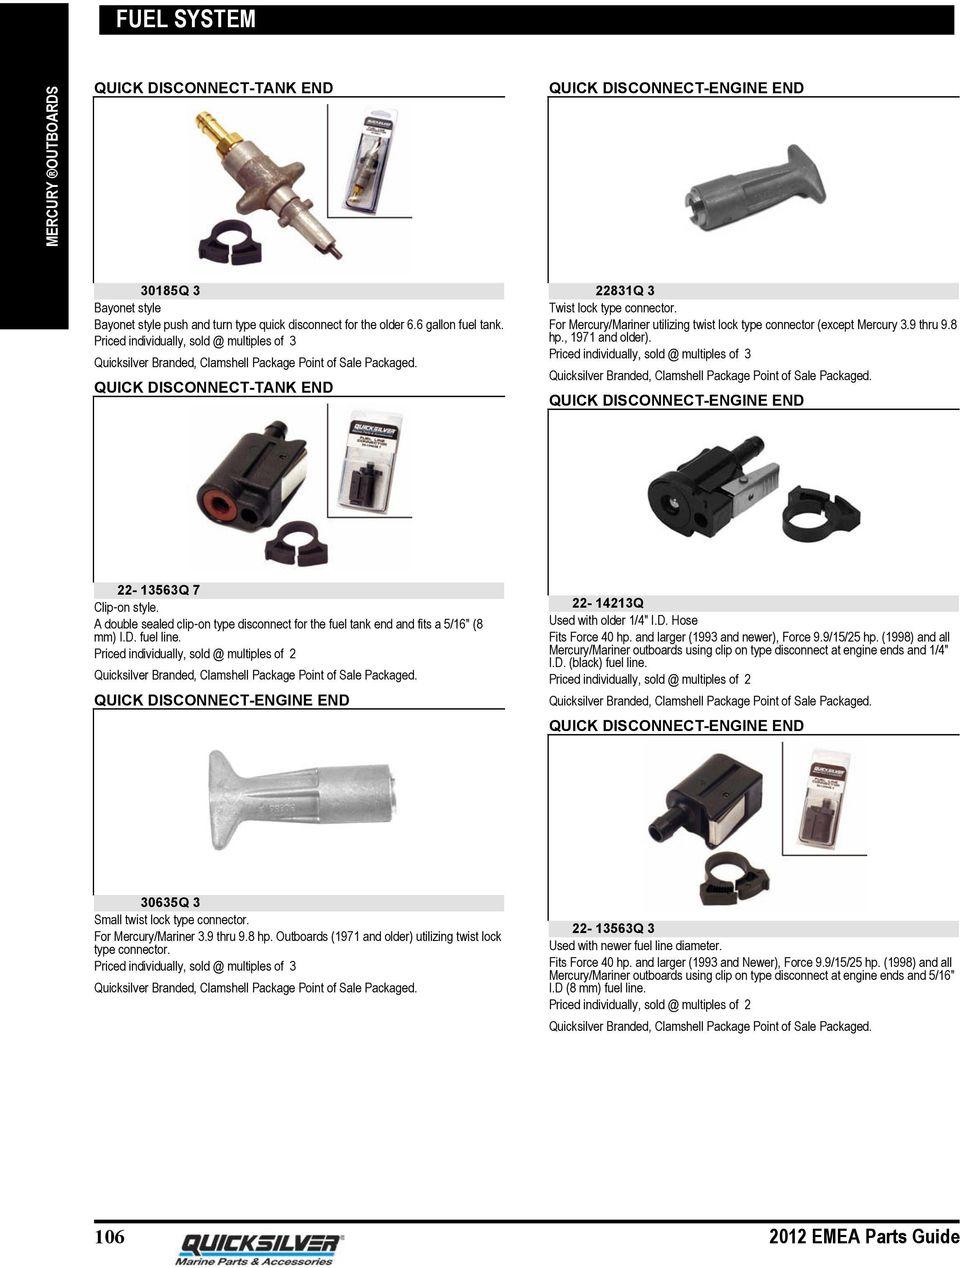 hight resolution of for mercury mariner utilizing twist lock type connector except mercury 3 9 thru 9 8 hp